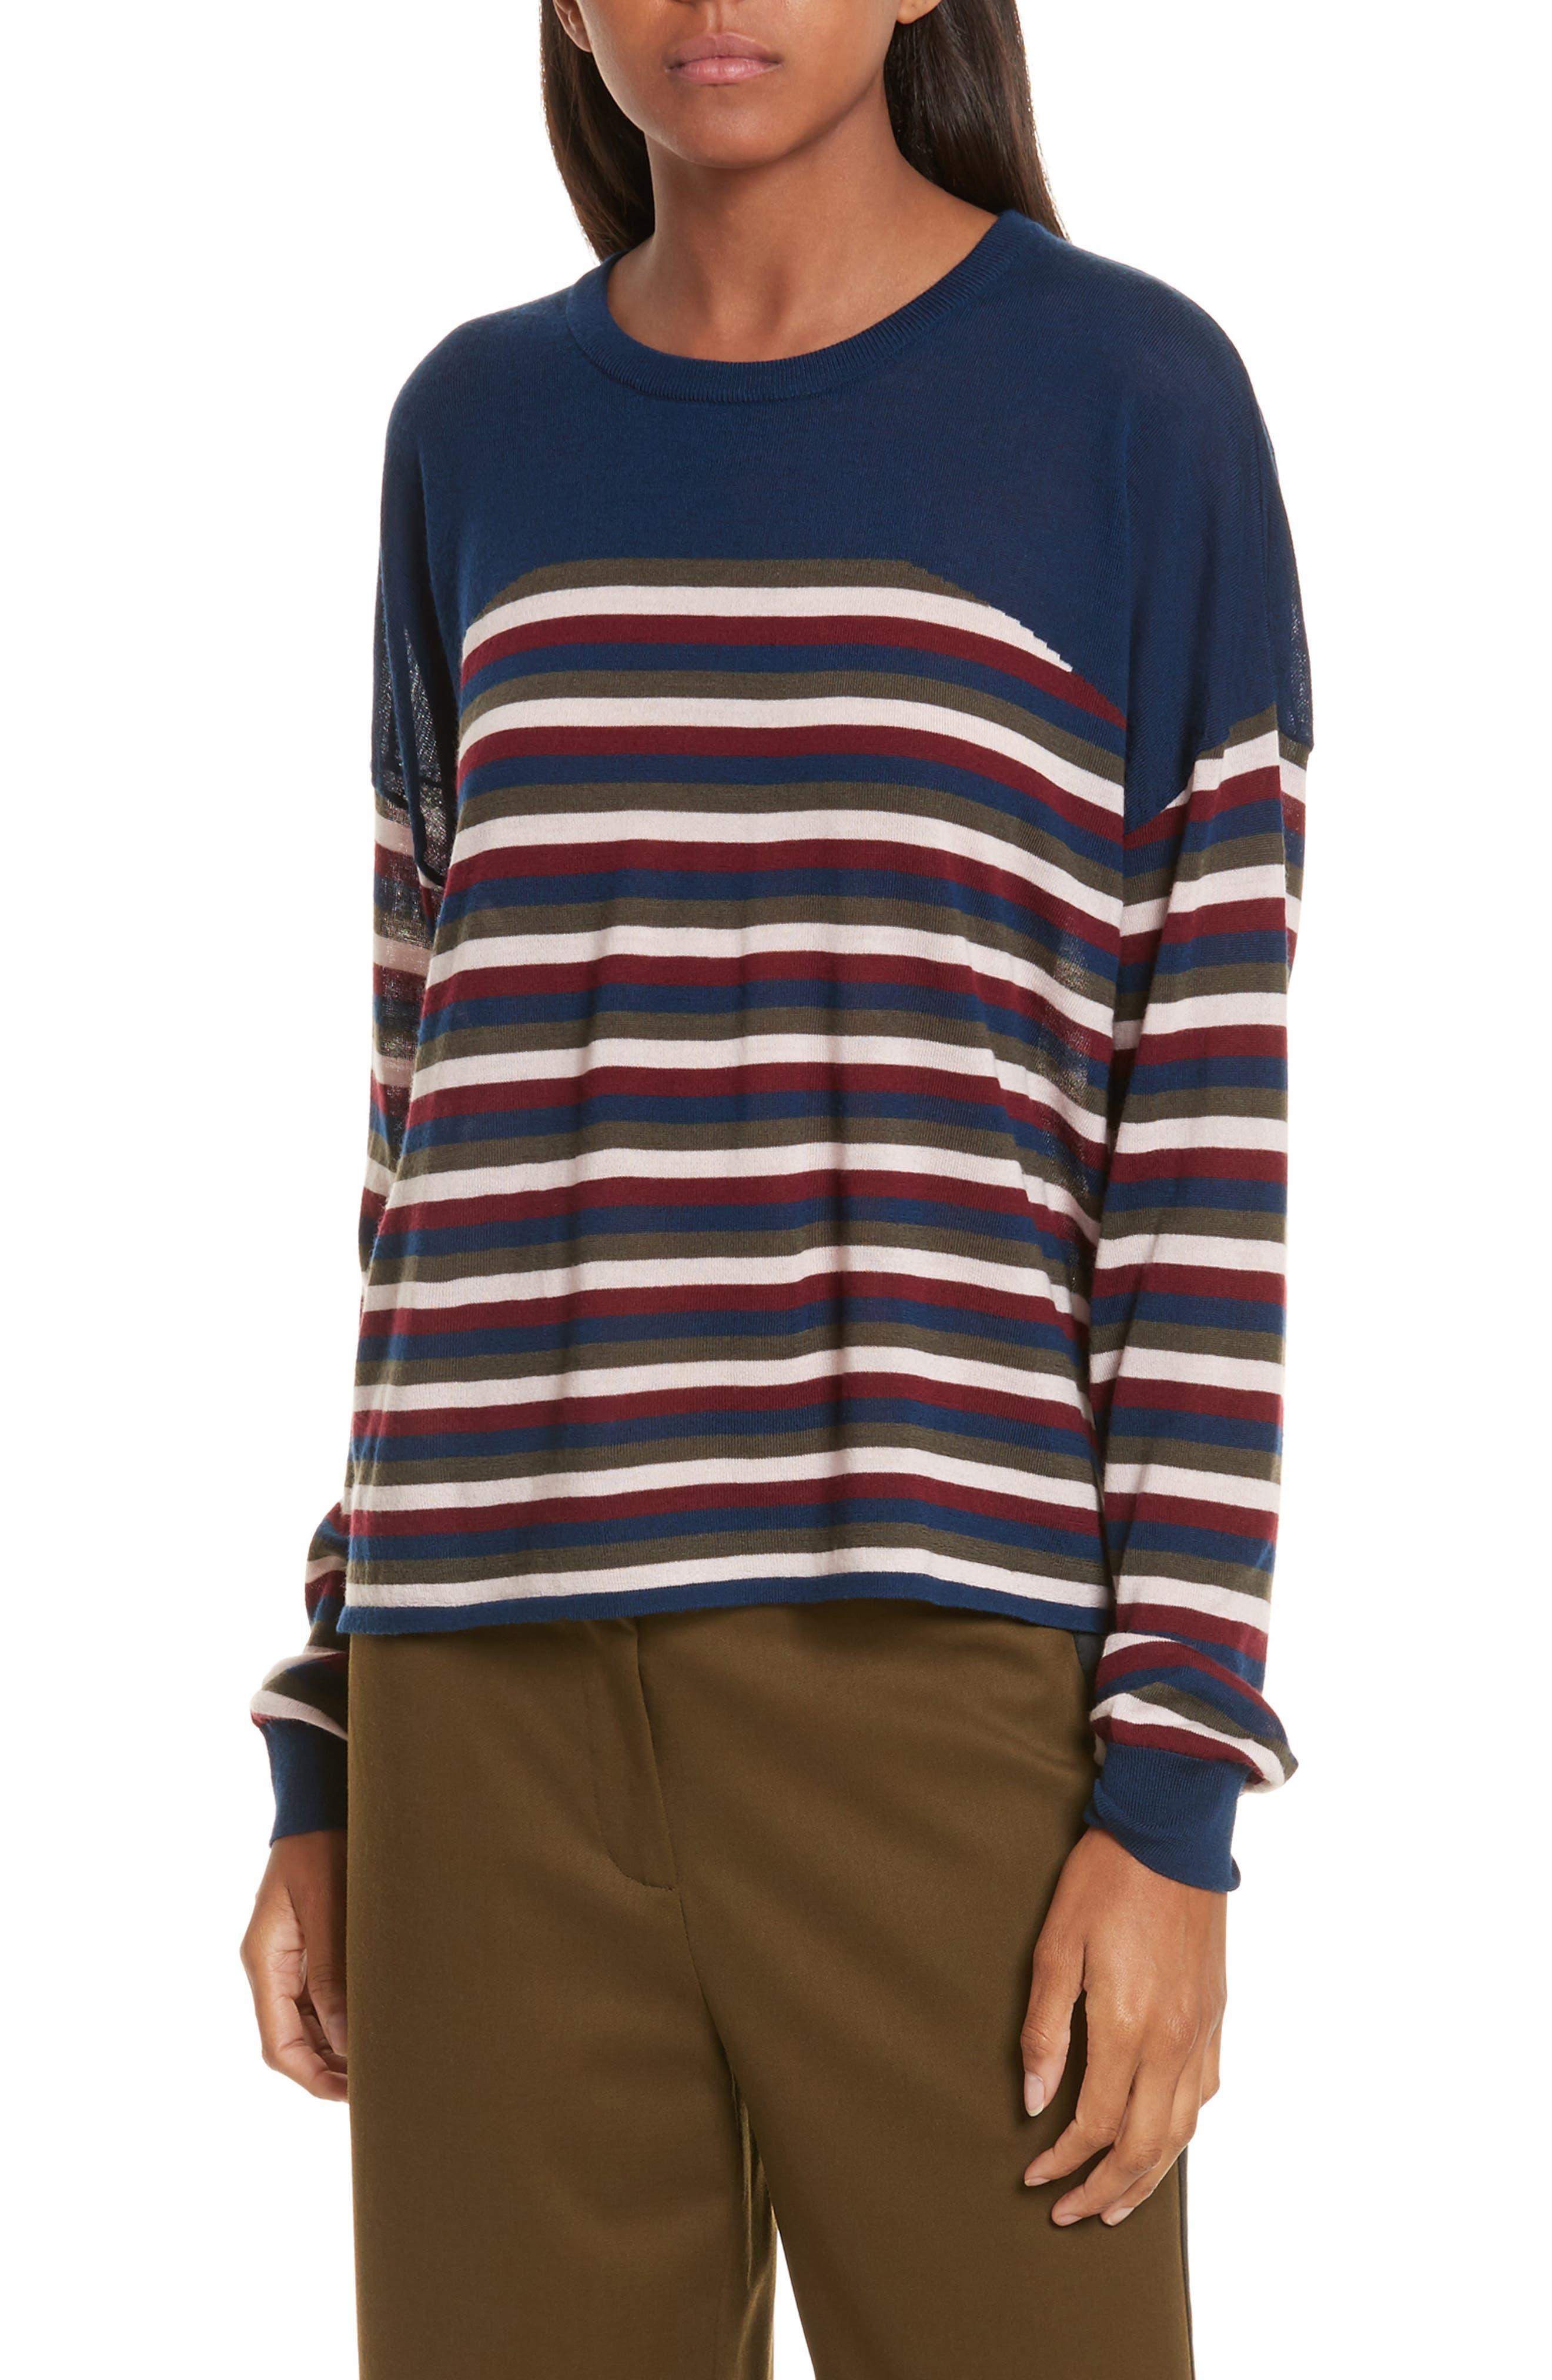 Alternate Image 1 Selected - GREY Jason Wu Stripe Knit Pullover